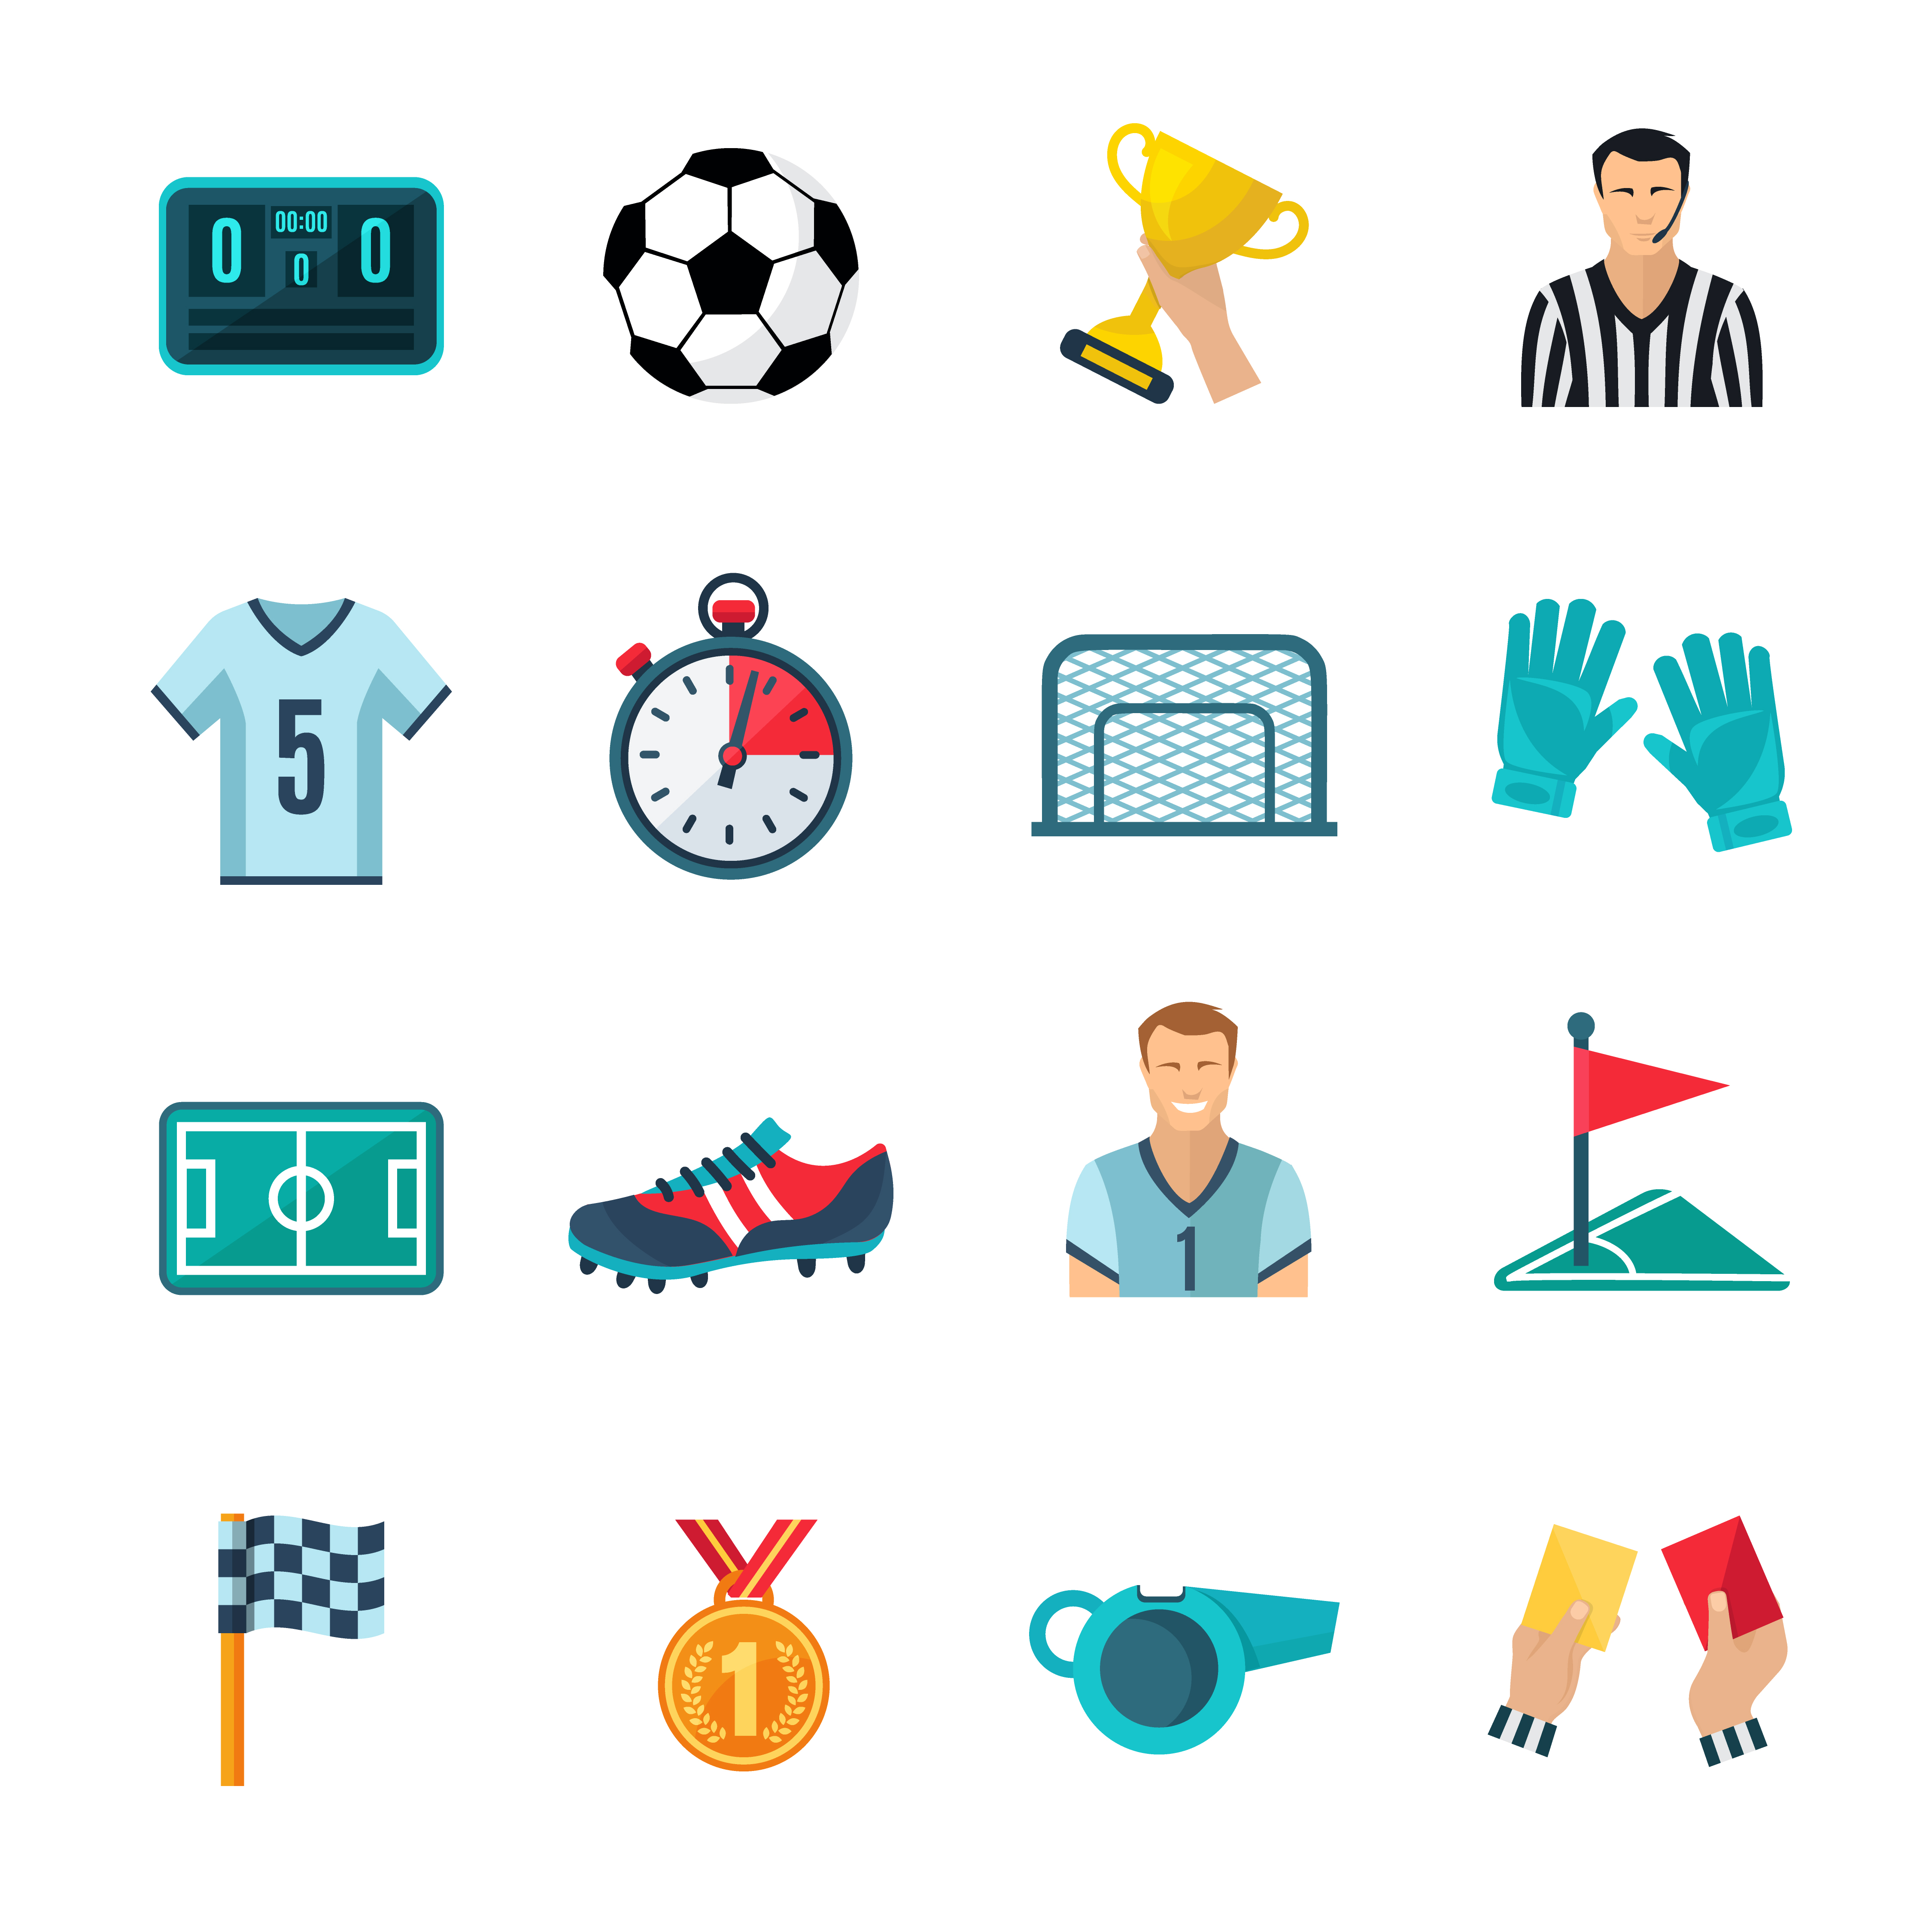 Fussball Icon